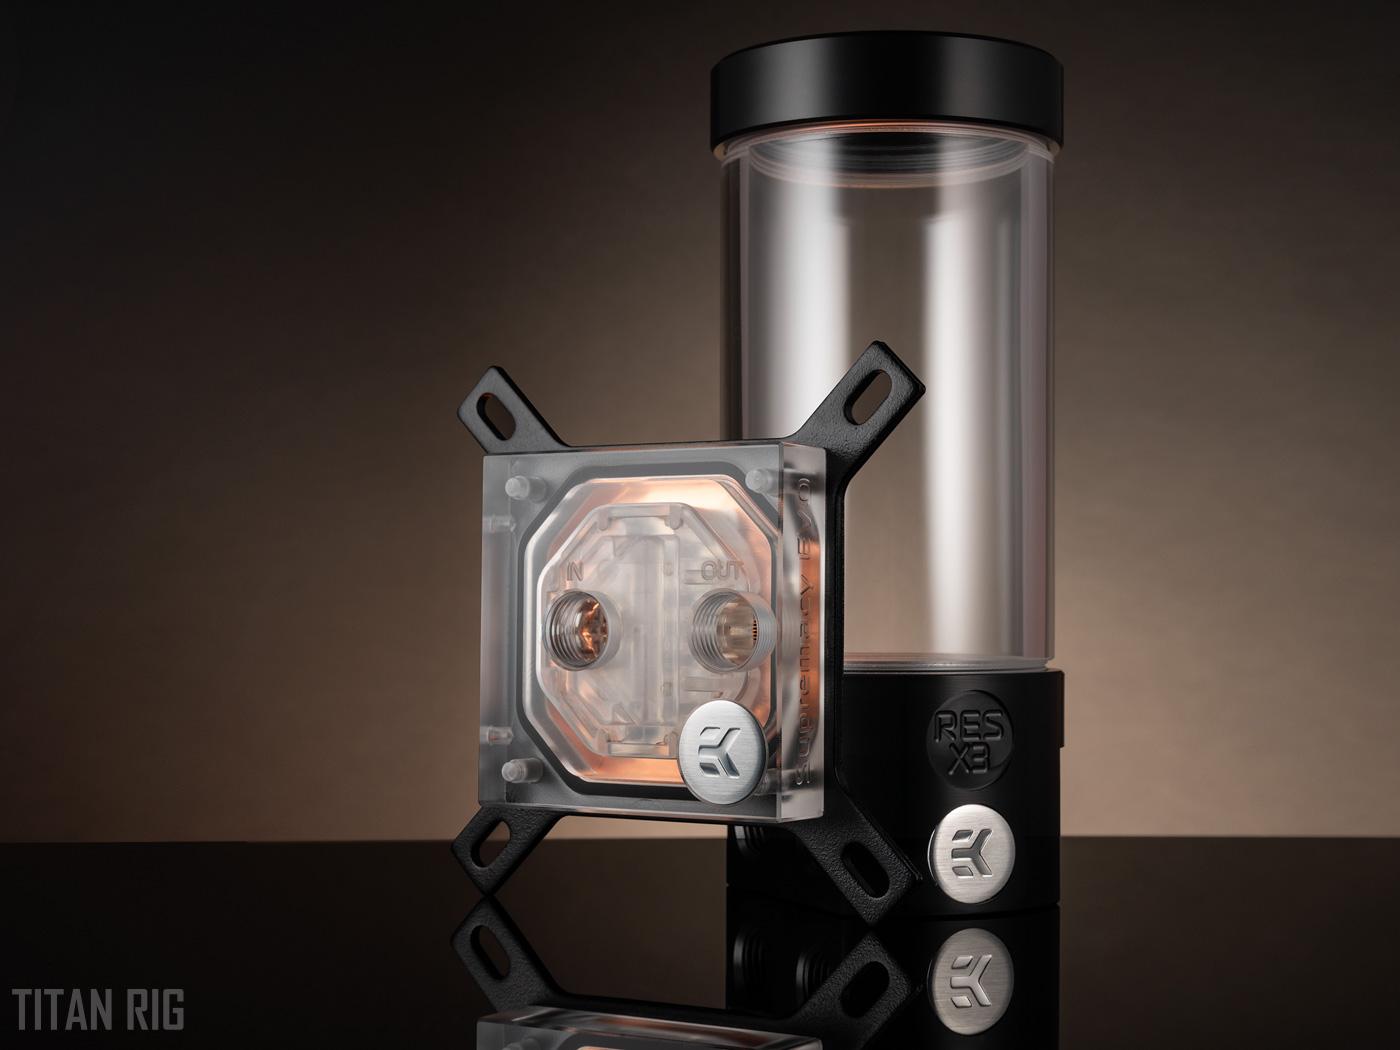 EKWB reservoir and copper CPU water block in EK custom water cooling kits